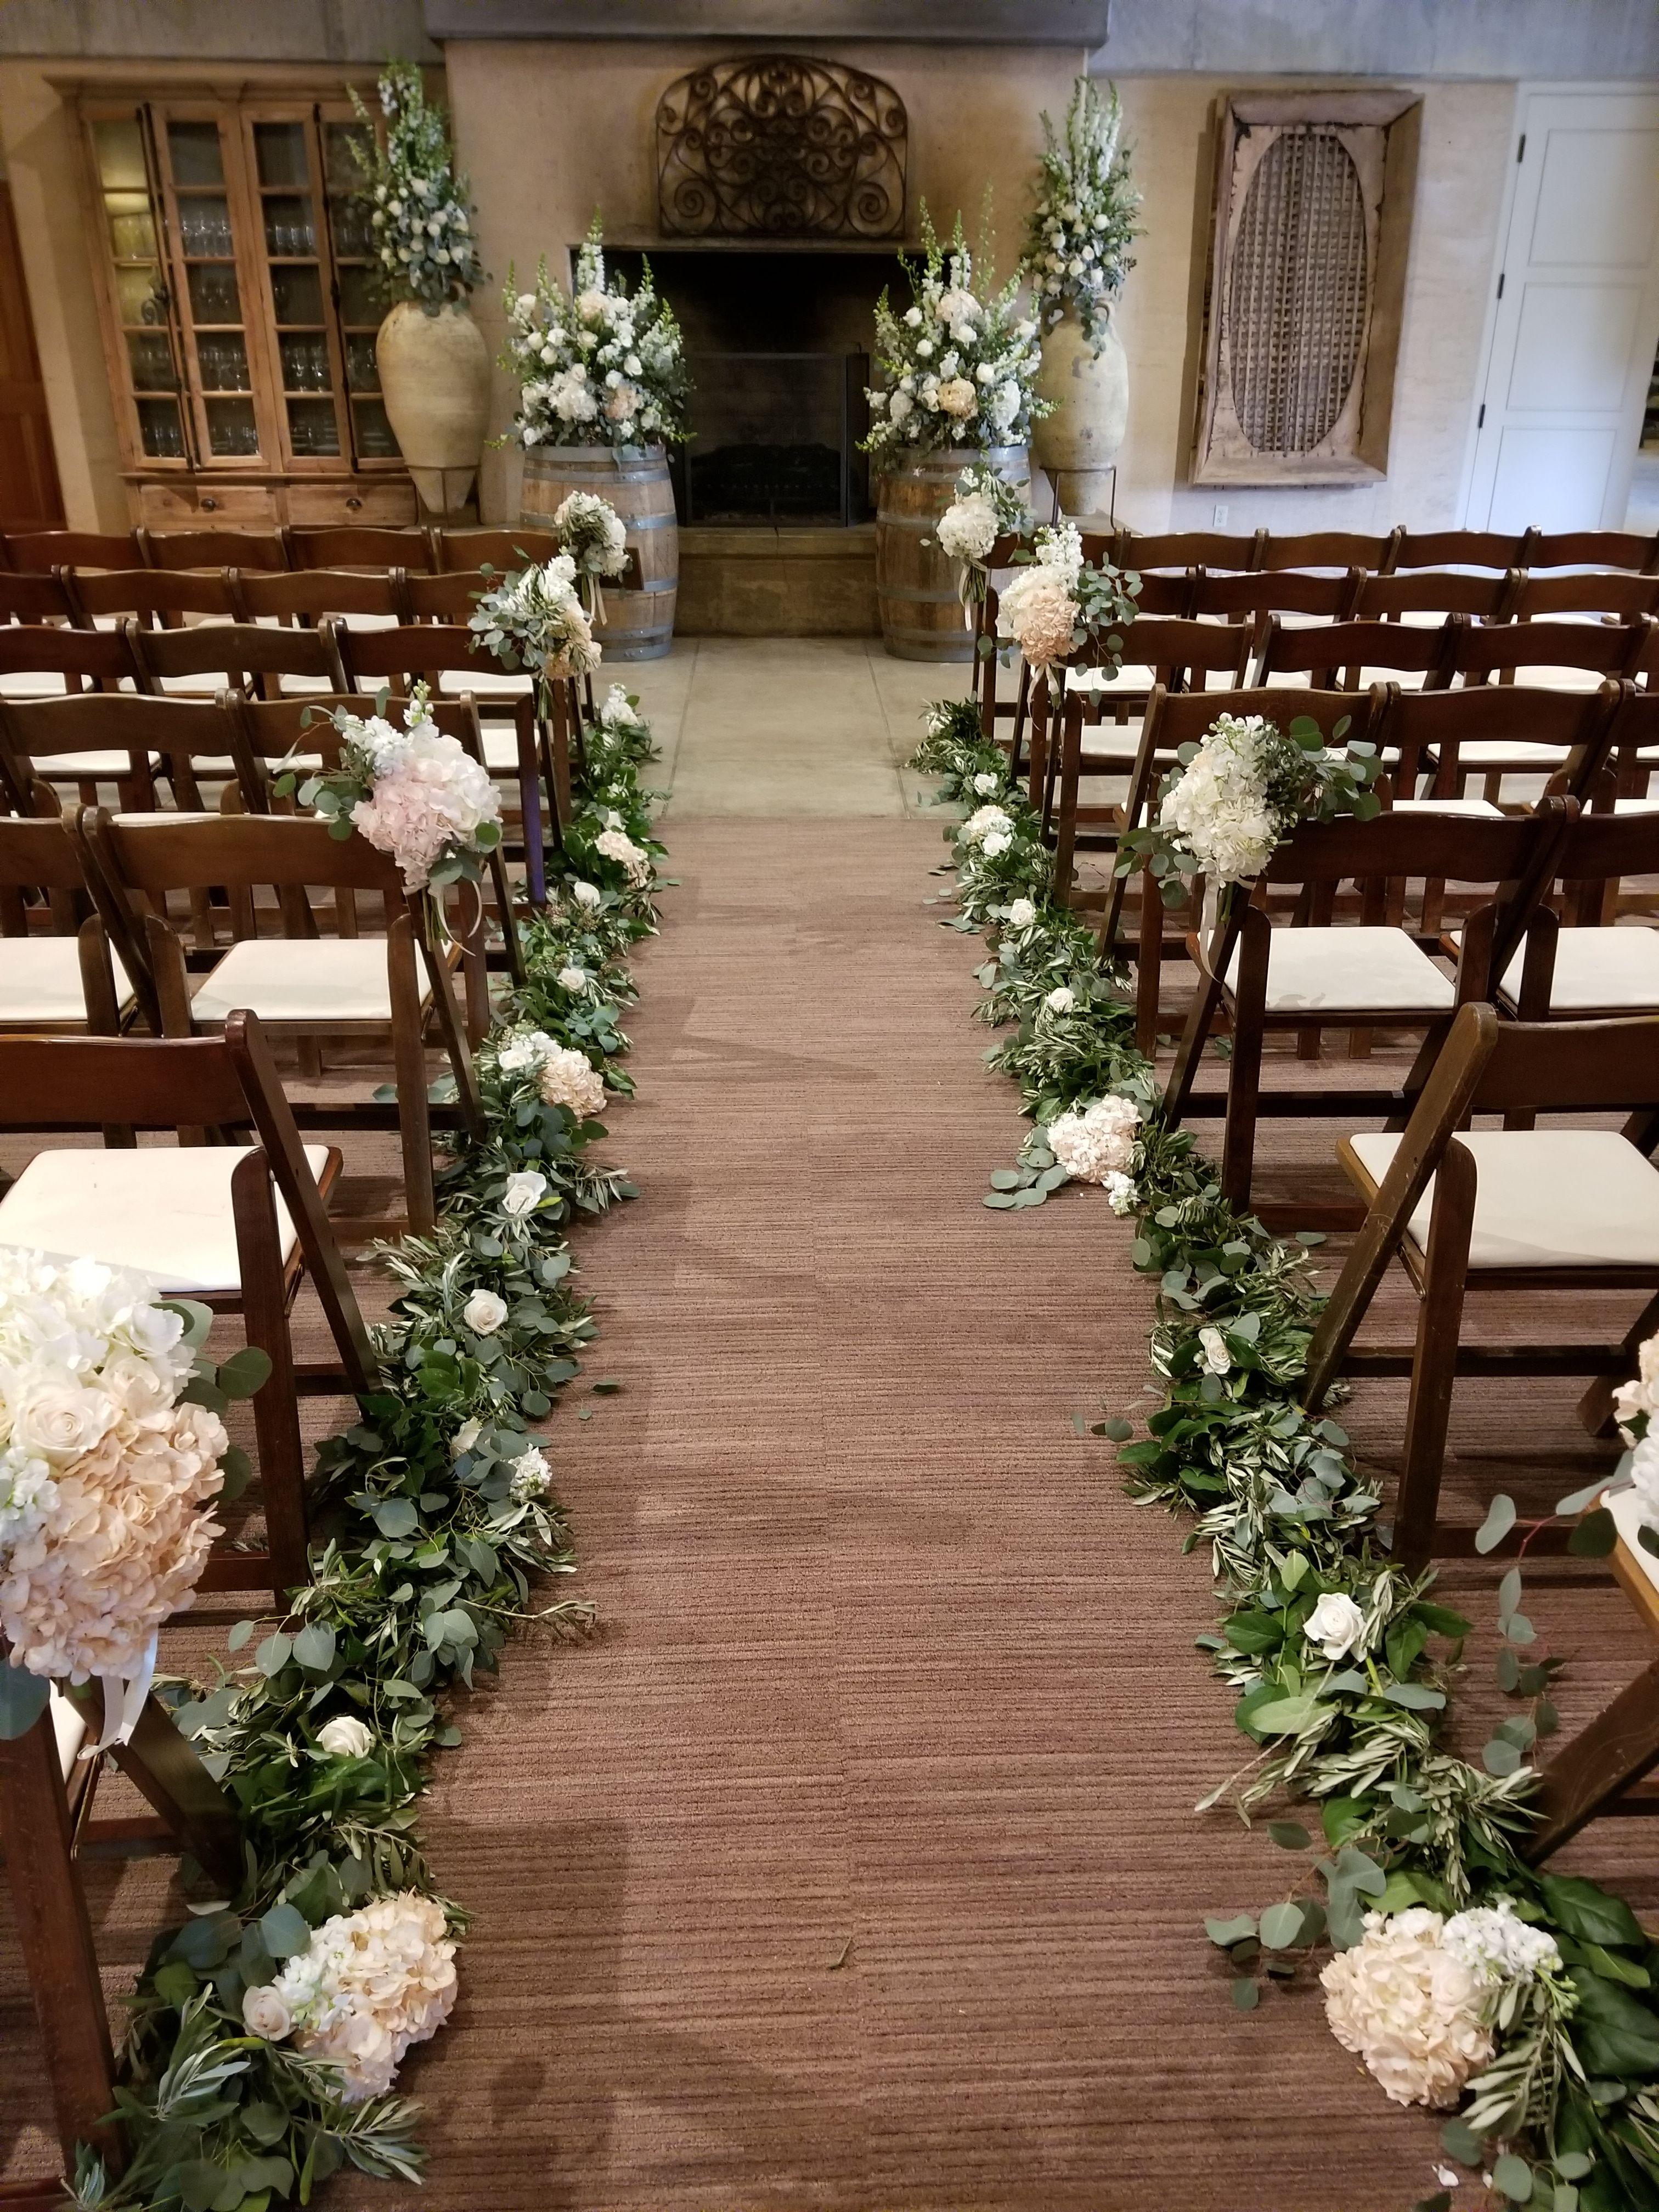 Sonoma Wedding Ramekins Indoor Wedding Aisle Floral Featuring Eucalyptus Garland Wedding Aisle Decorations Church Wedding Flowers Church Wedding Decorations